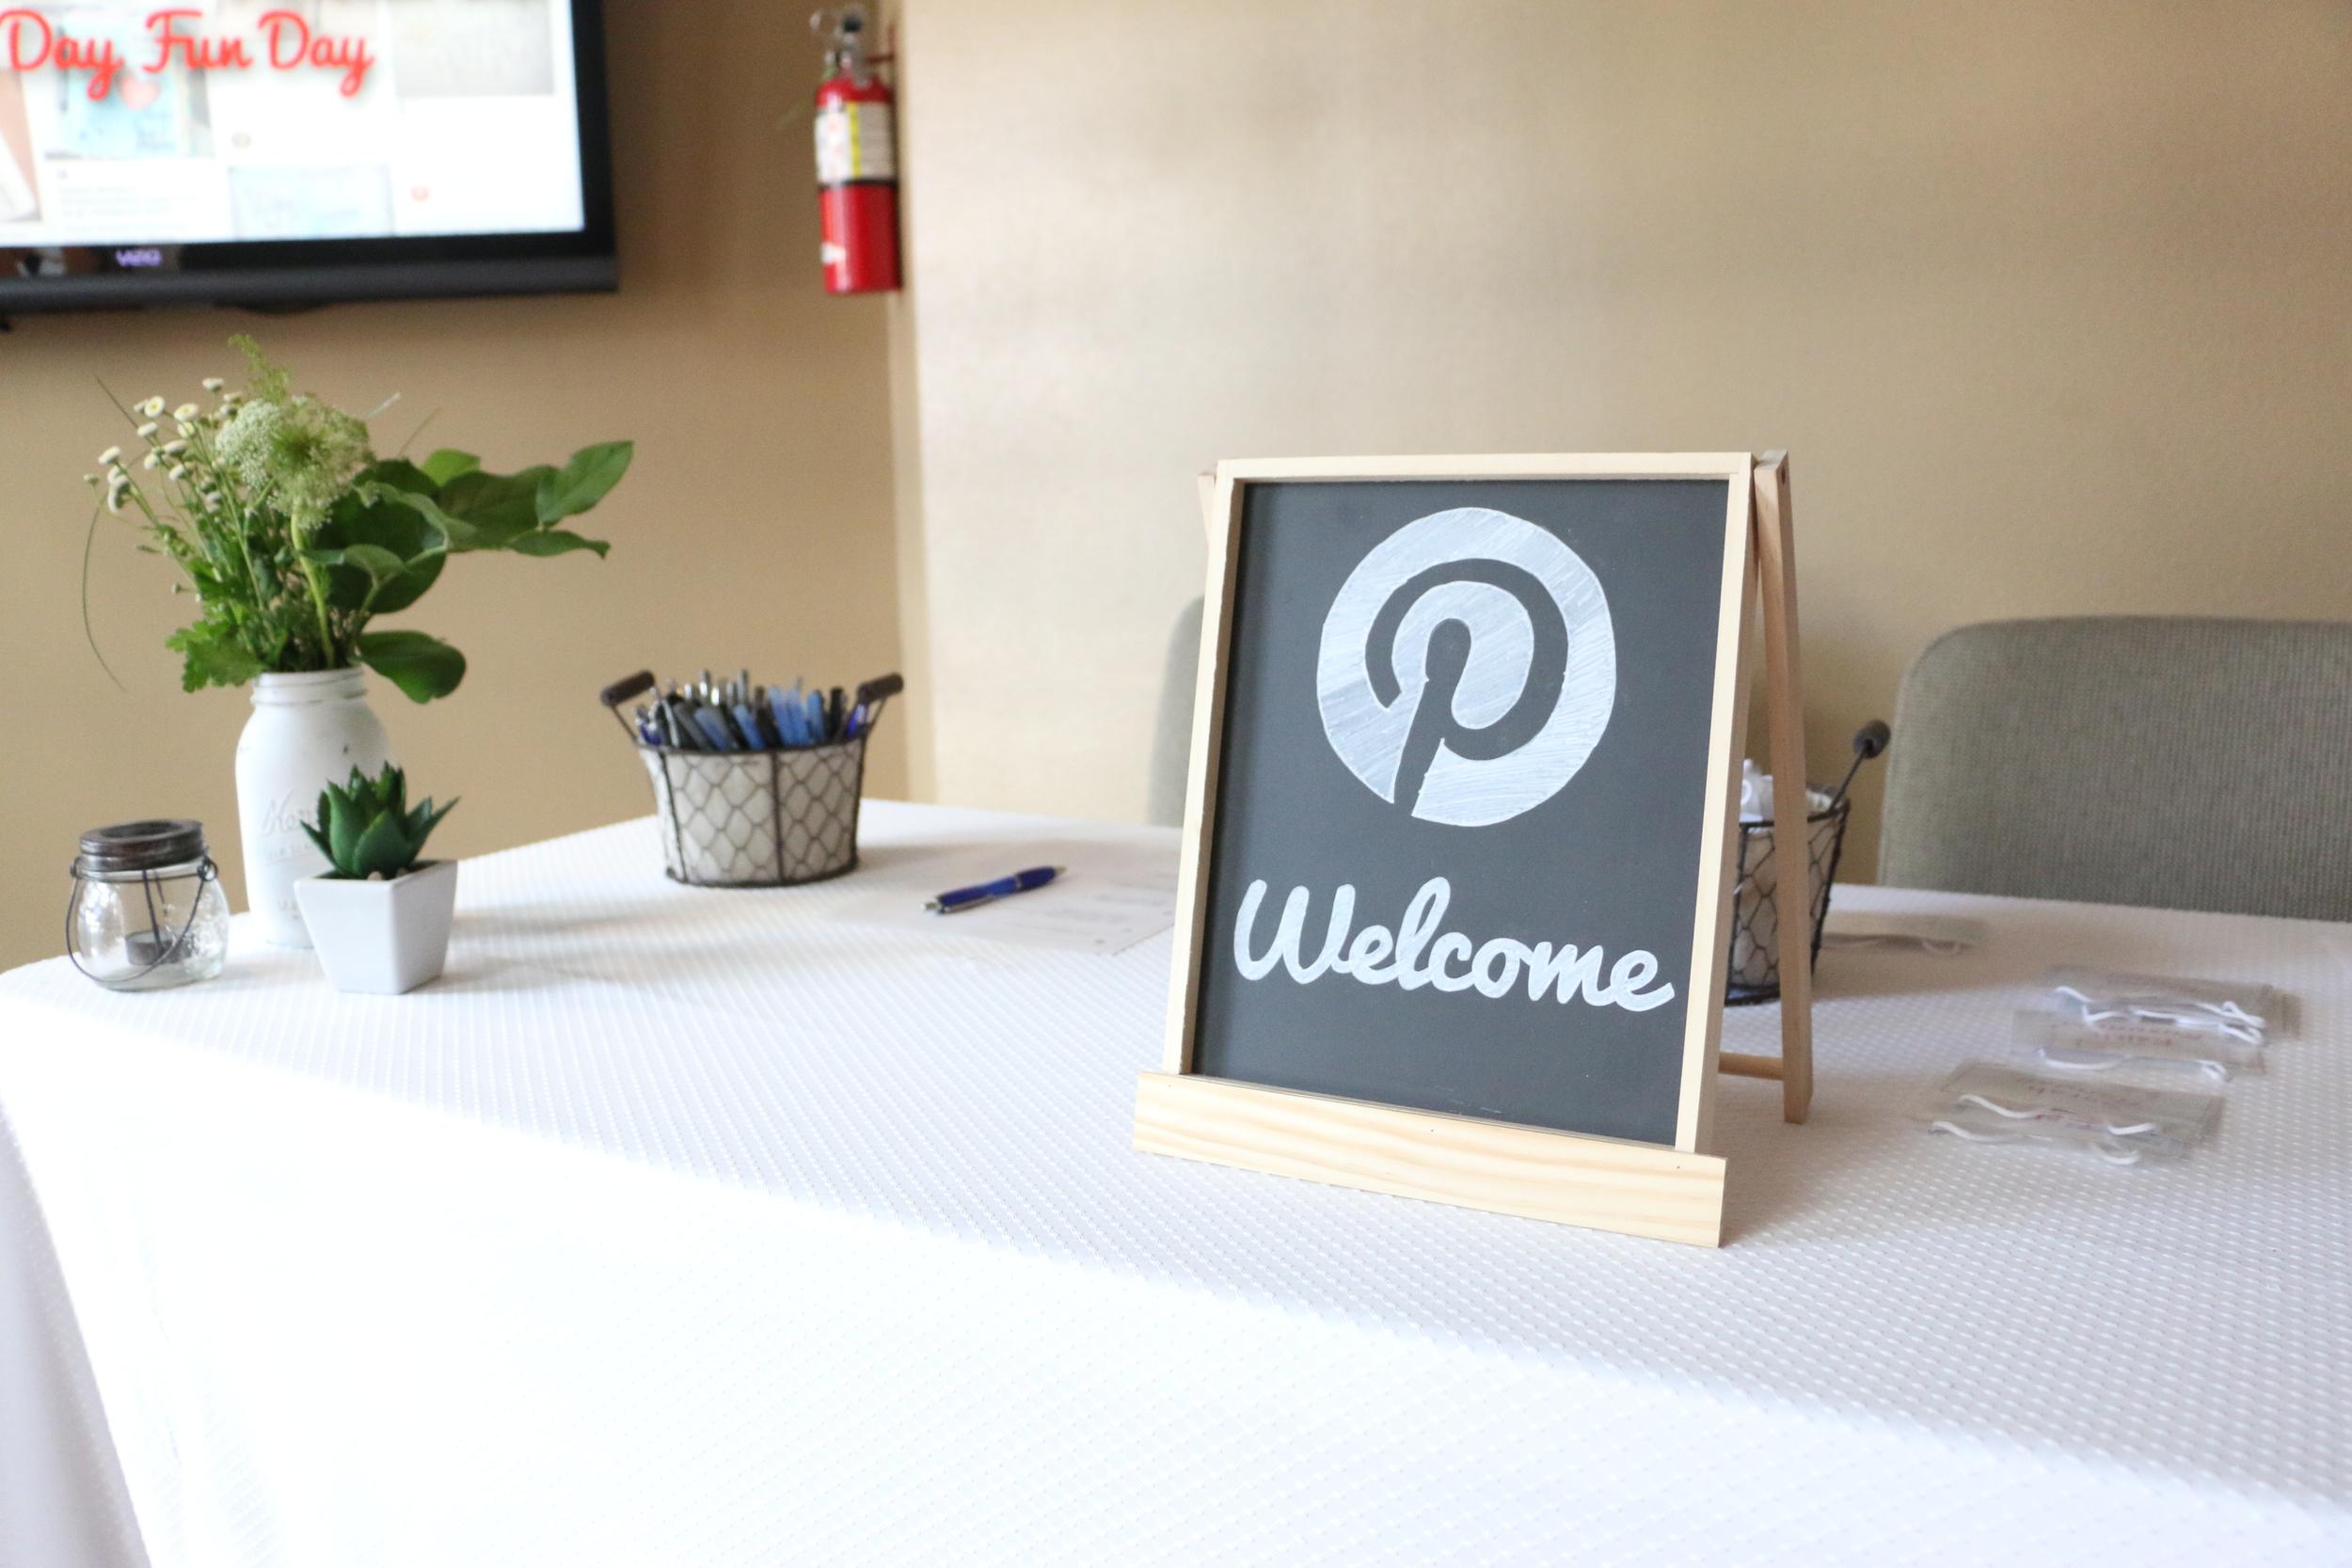 Pinterest & Proverbs Fun Day